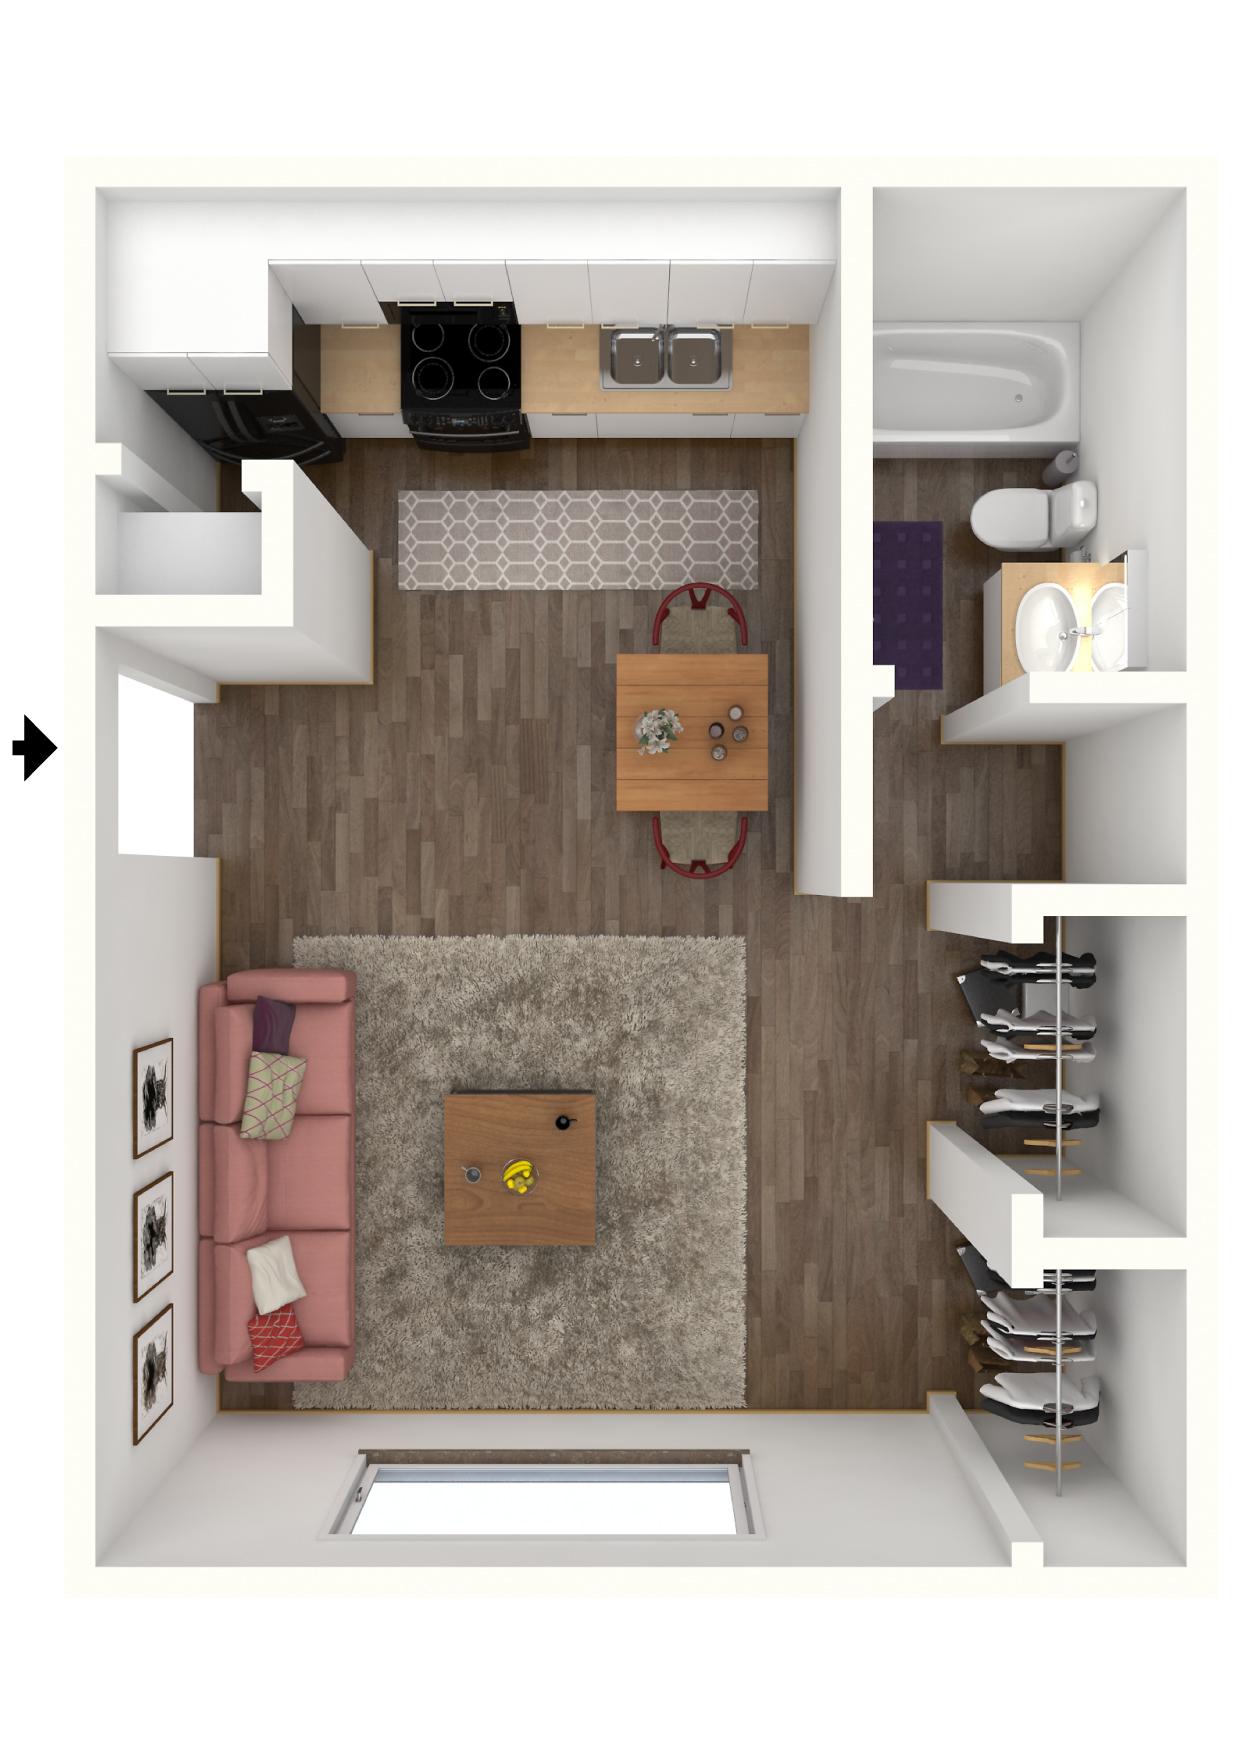 Interesting Citybase Vista Apartments Bed Apartments Citybase Vista Apartments Average Studio Apartment Size apartment Average Studio Apartment Size